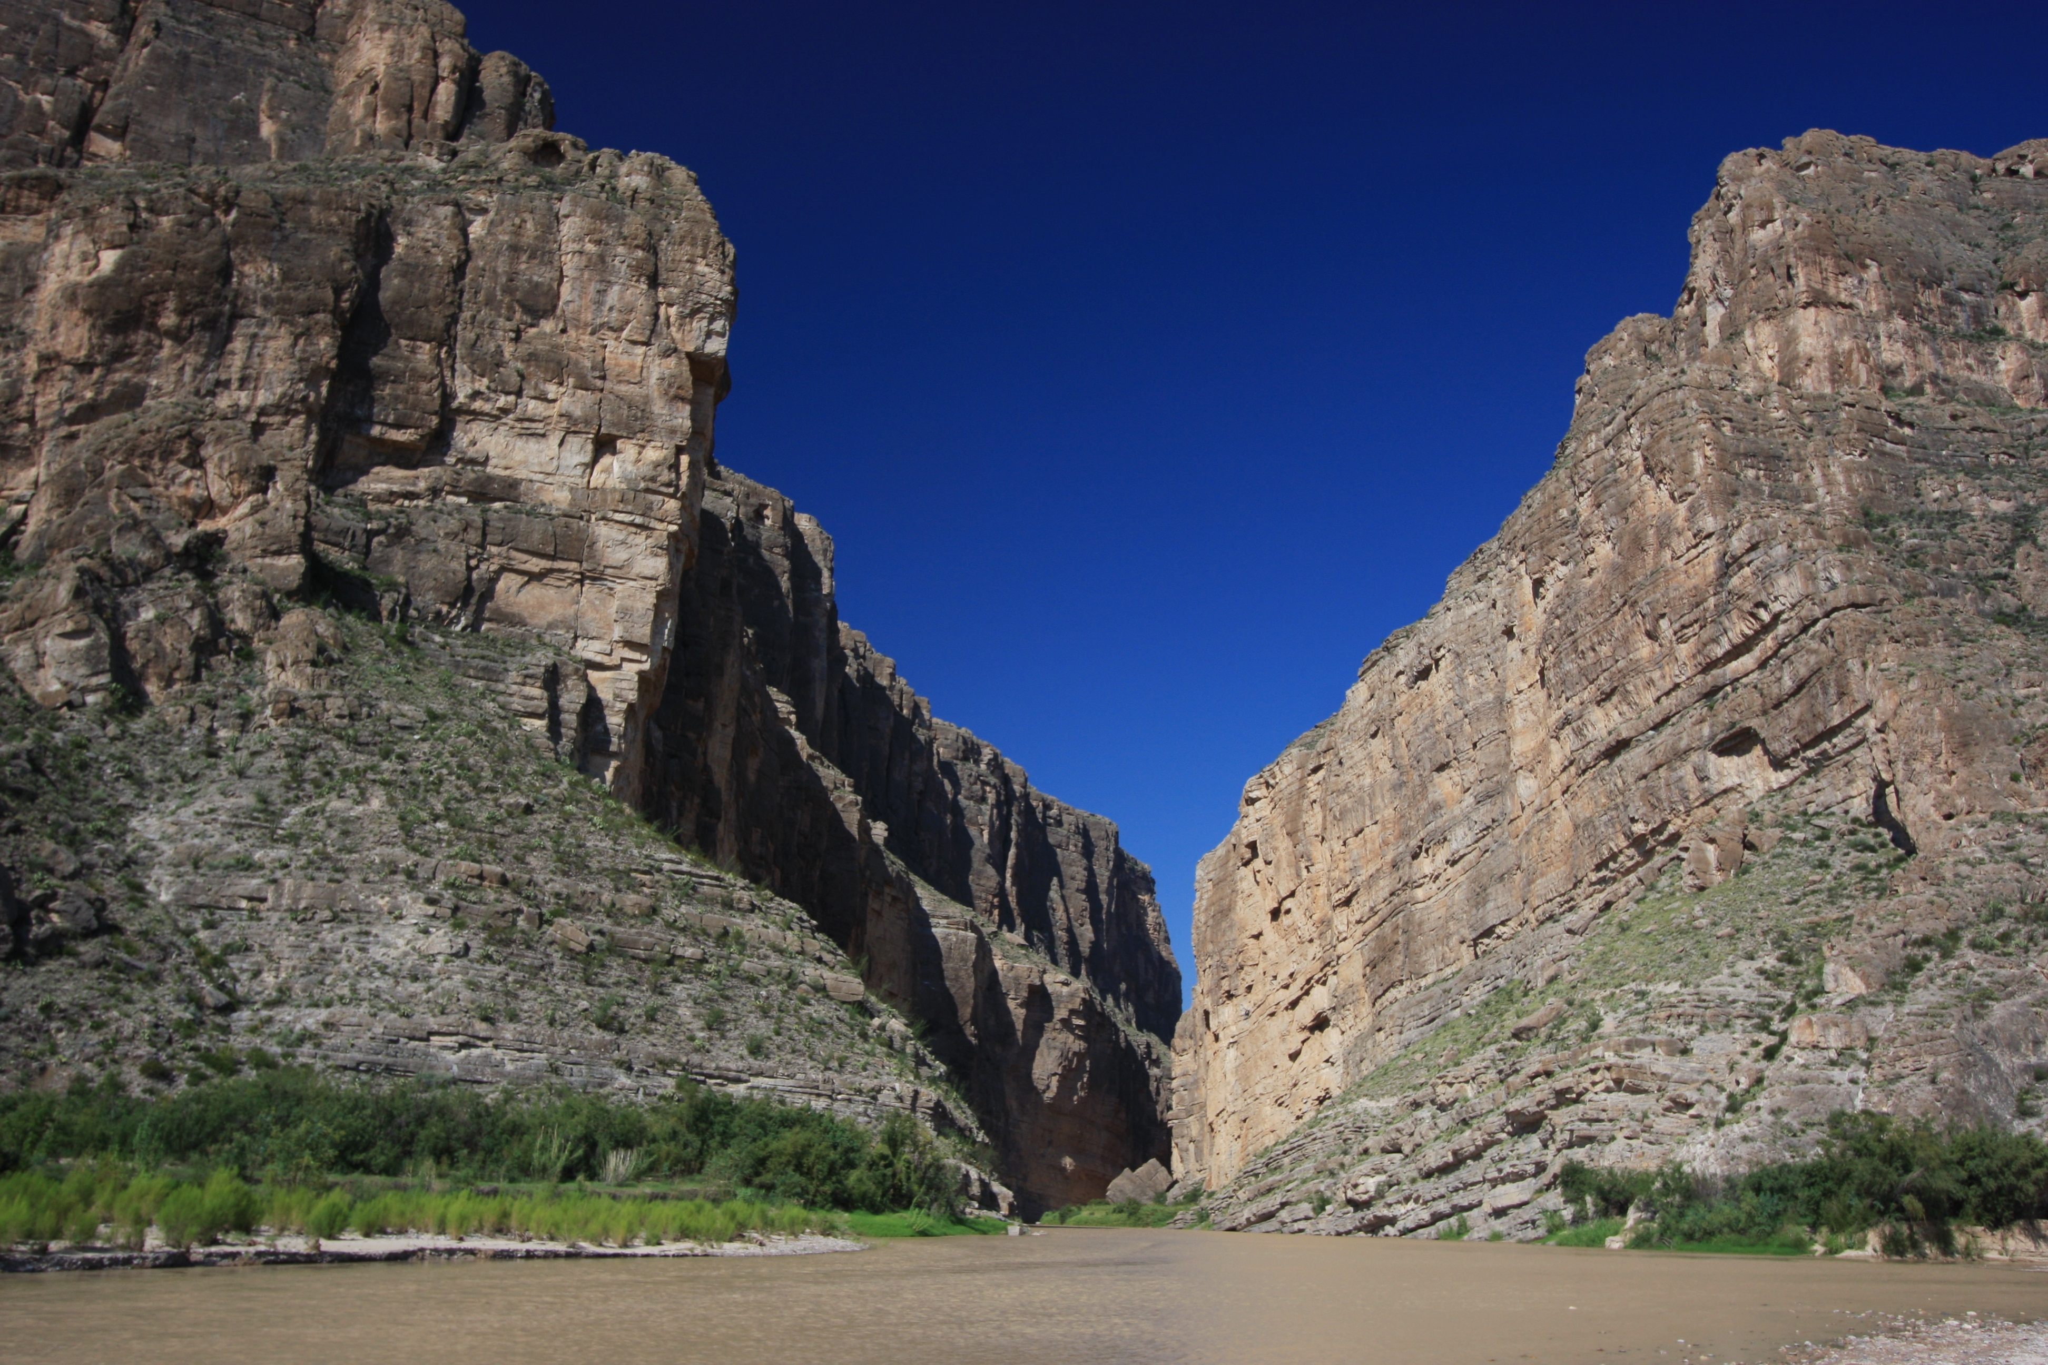 Texas: Marathon to Marfa via Big Bend National Park